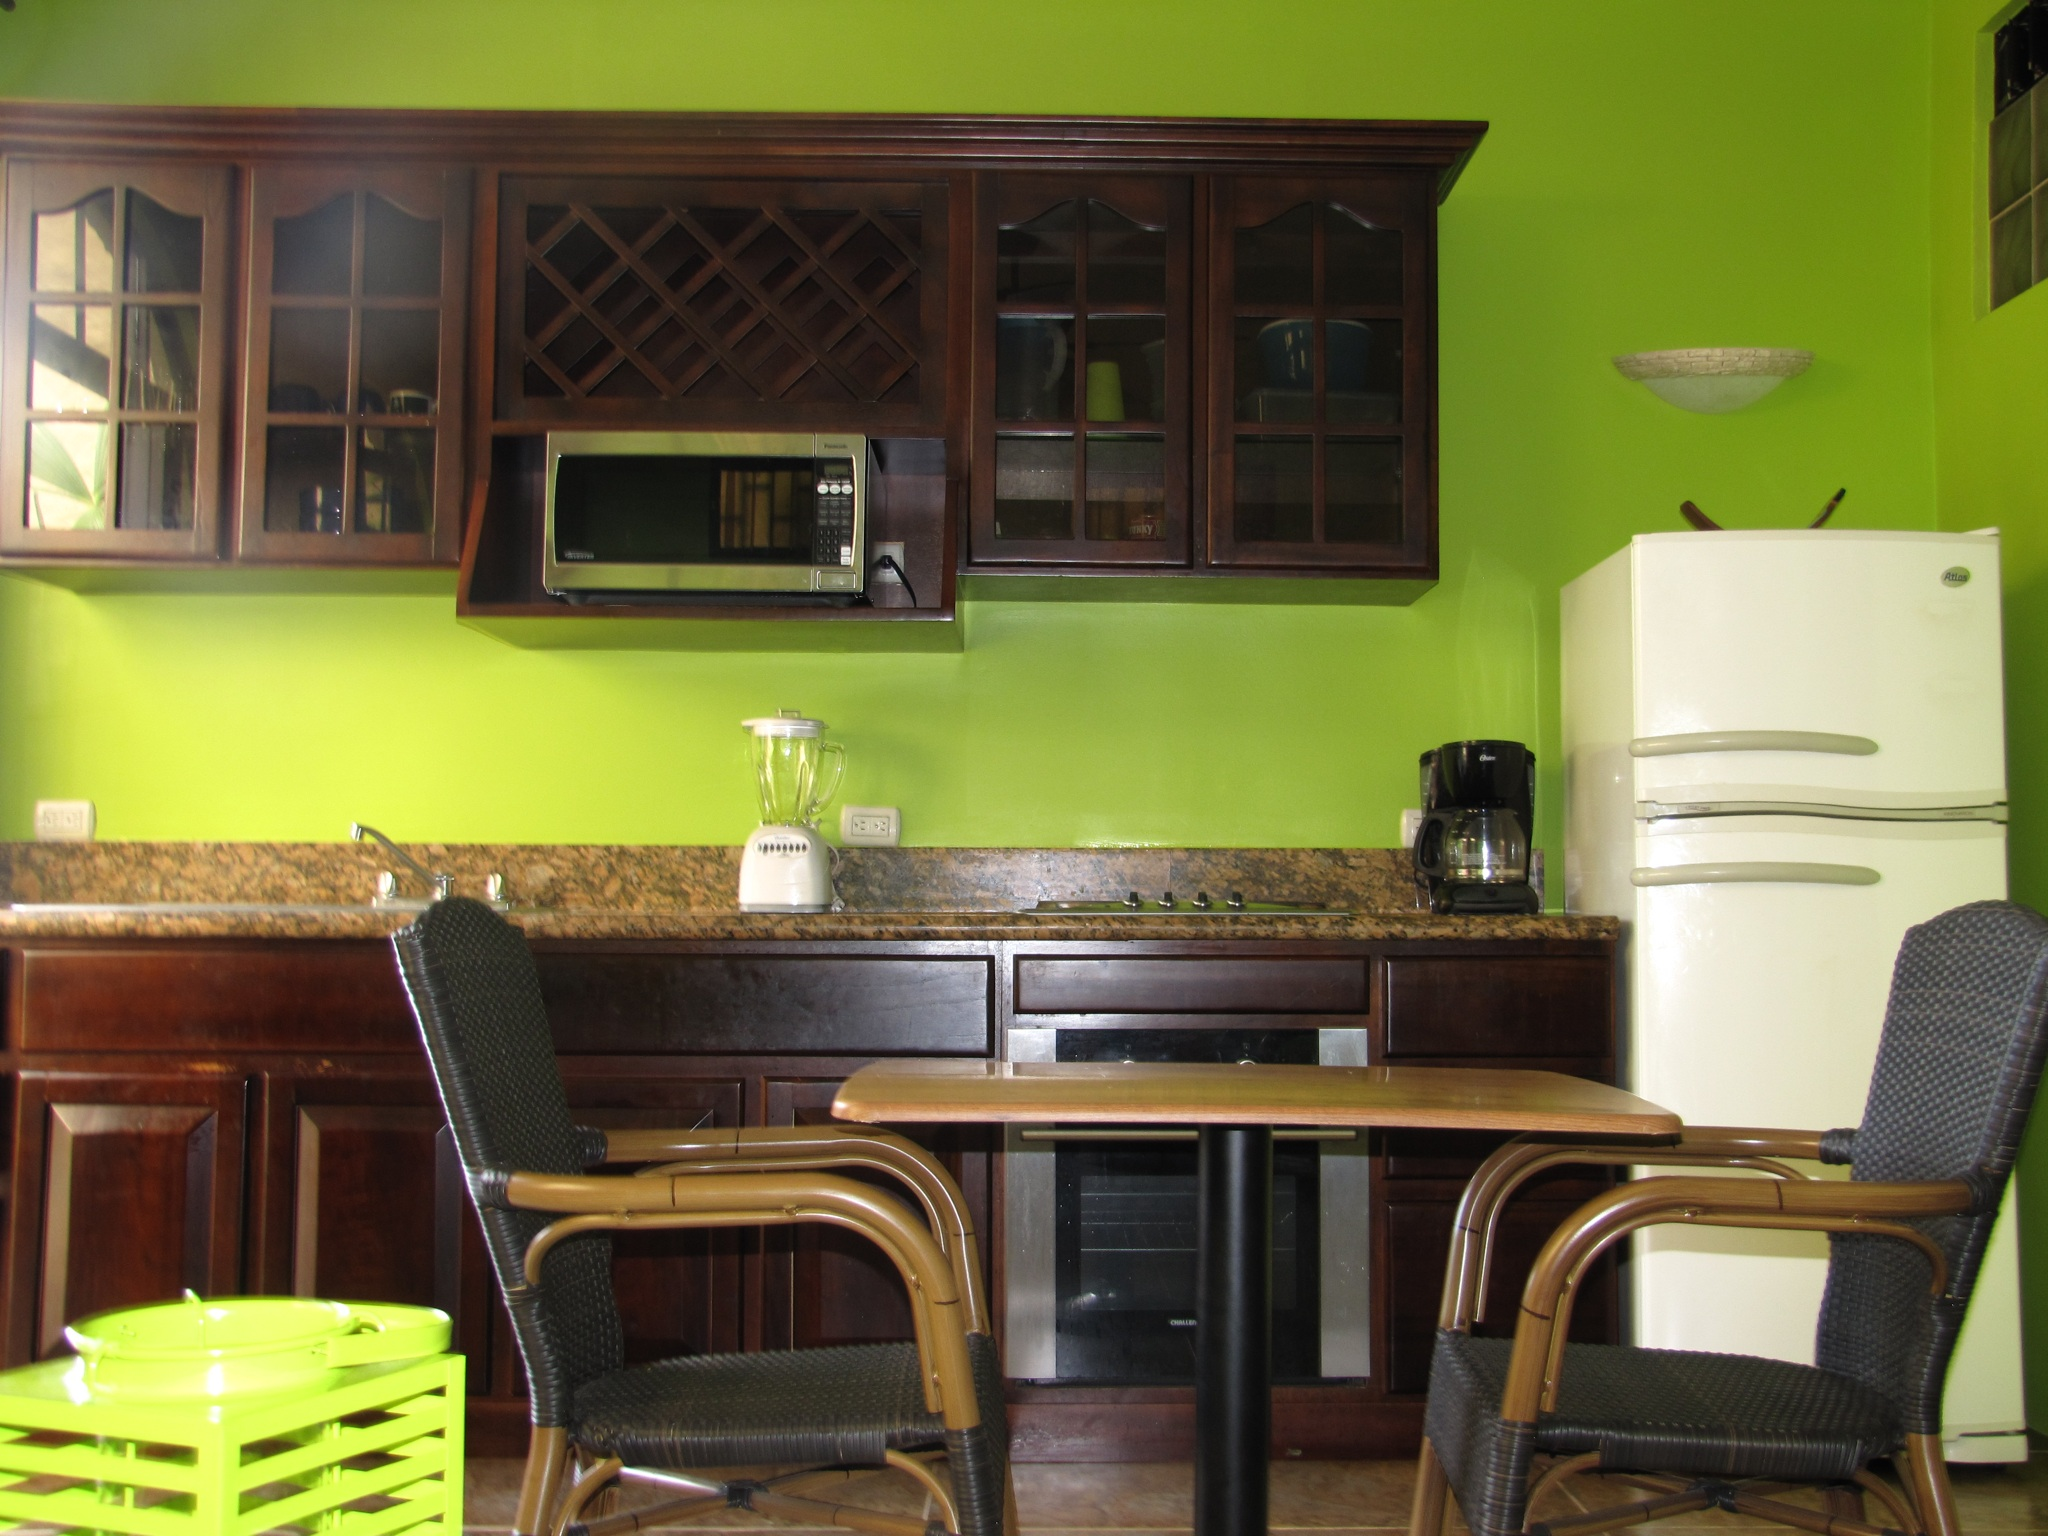 Key-Mar Villa Lower Studio